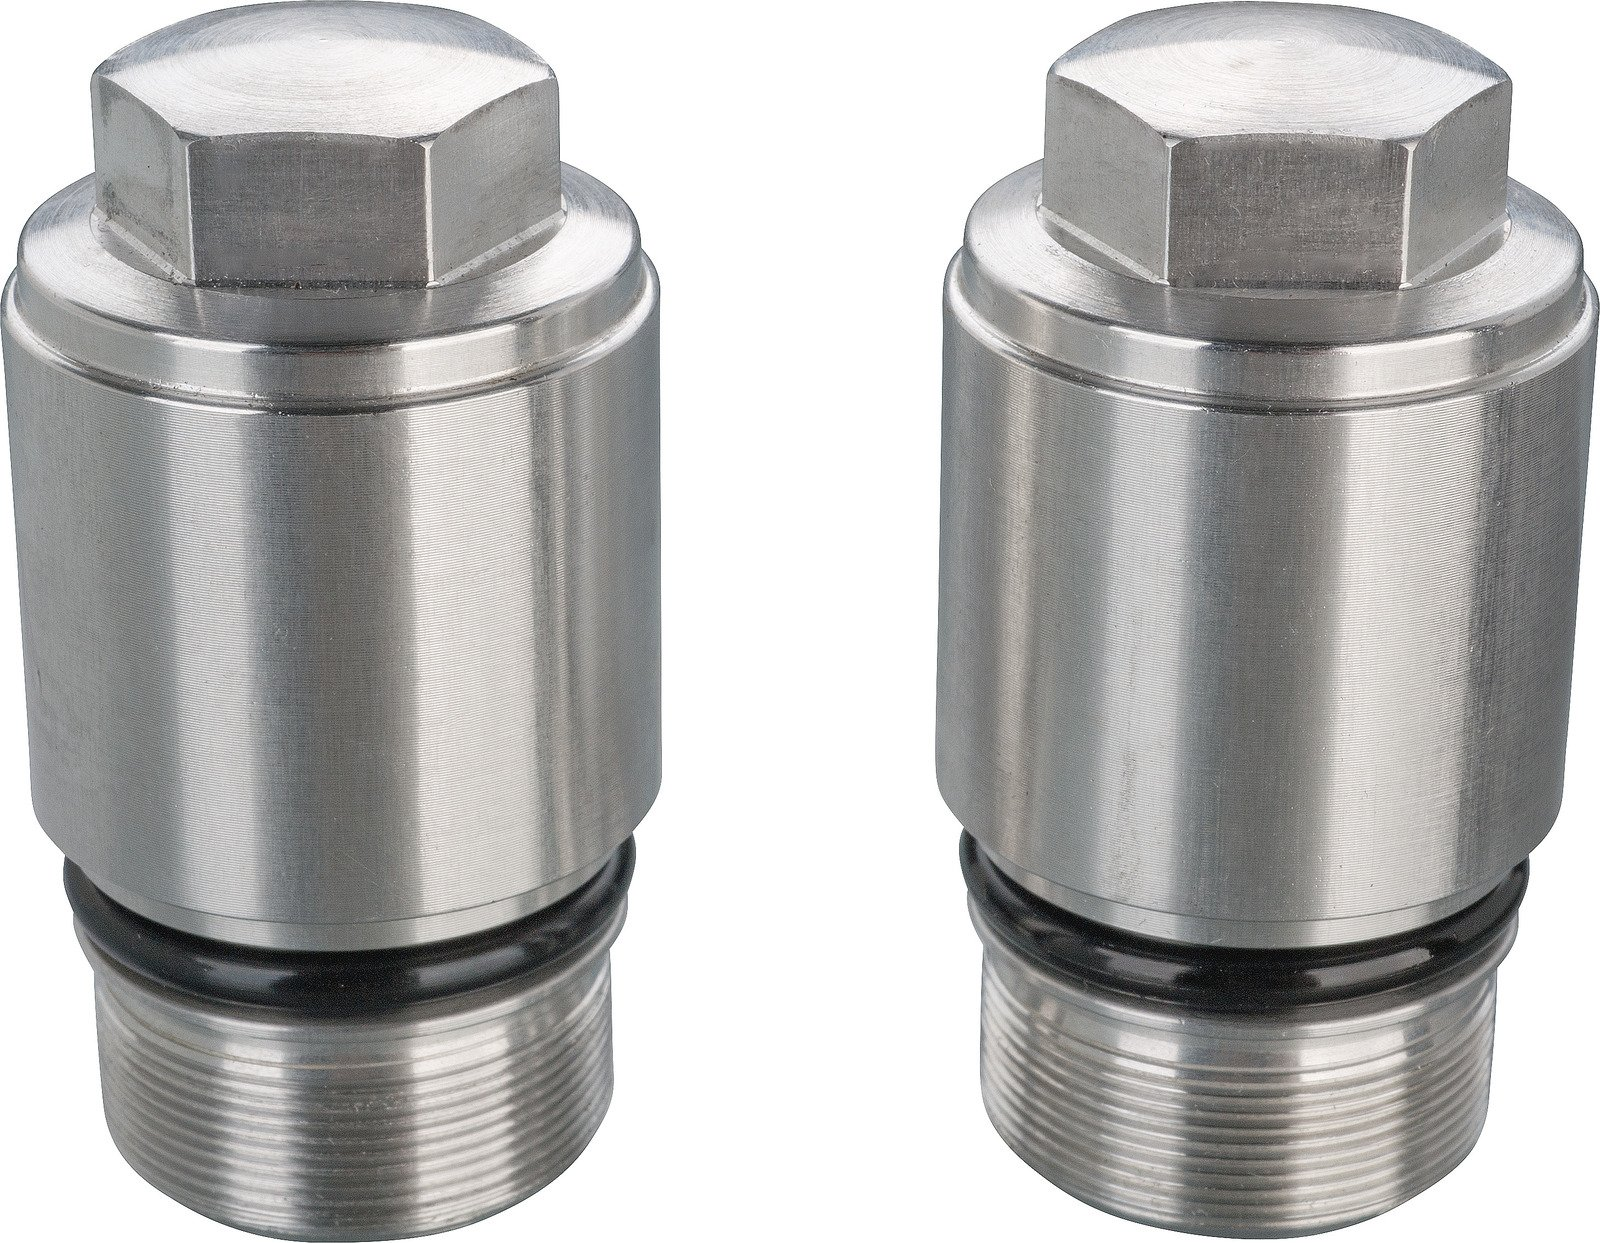 Aluminum Front Fork Extensions For Yamaha TT500 XT500 +30mm 5-155